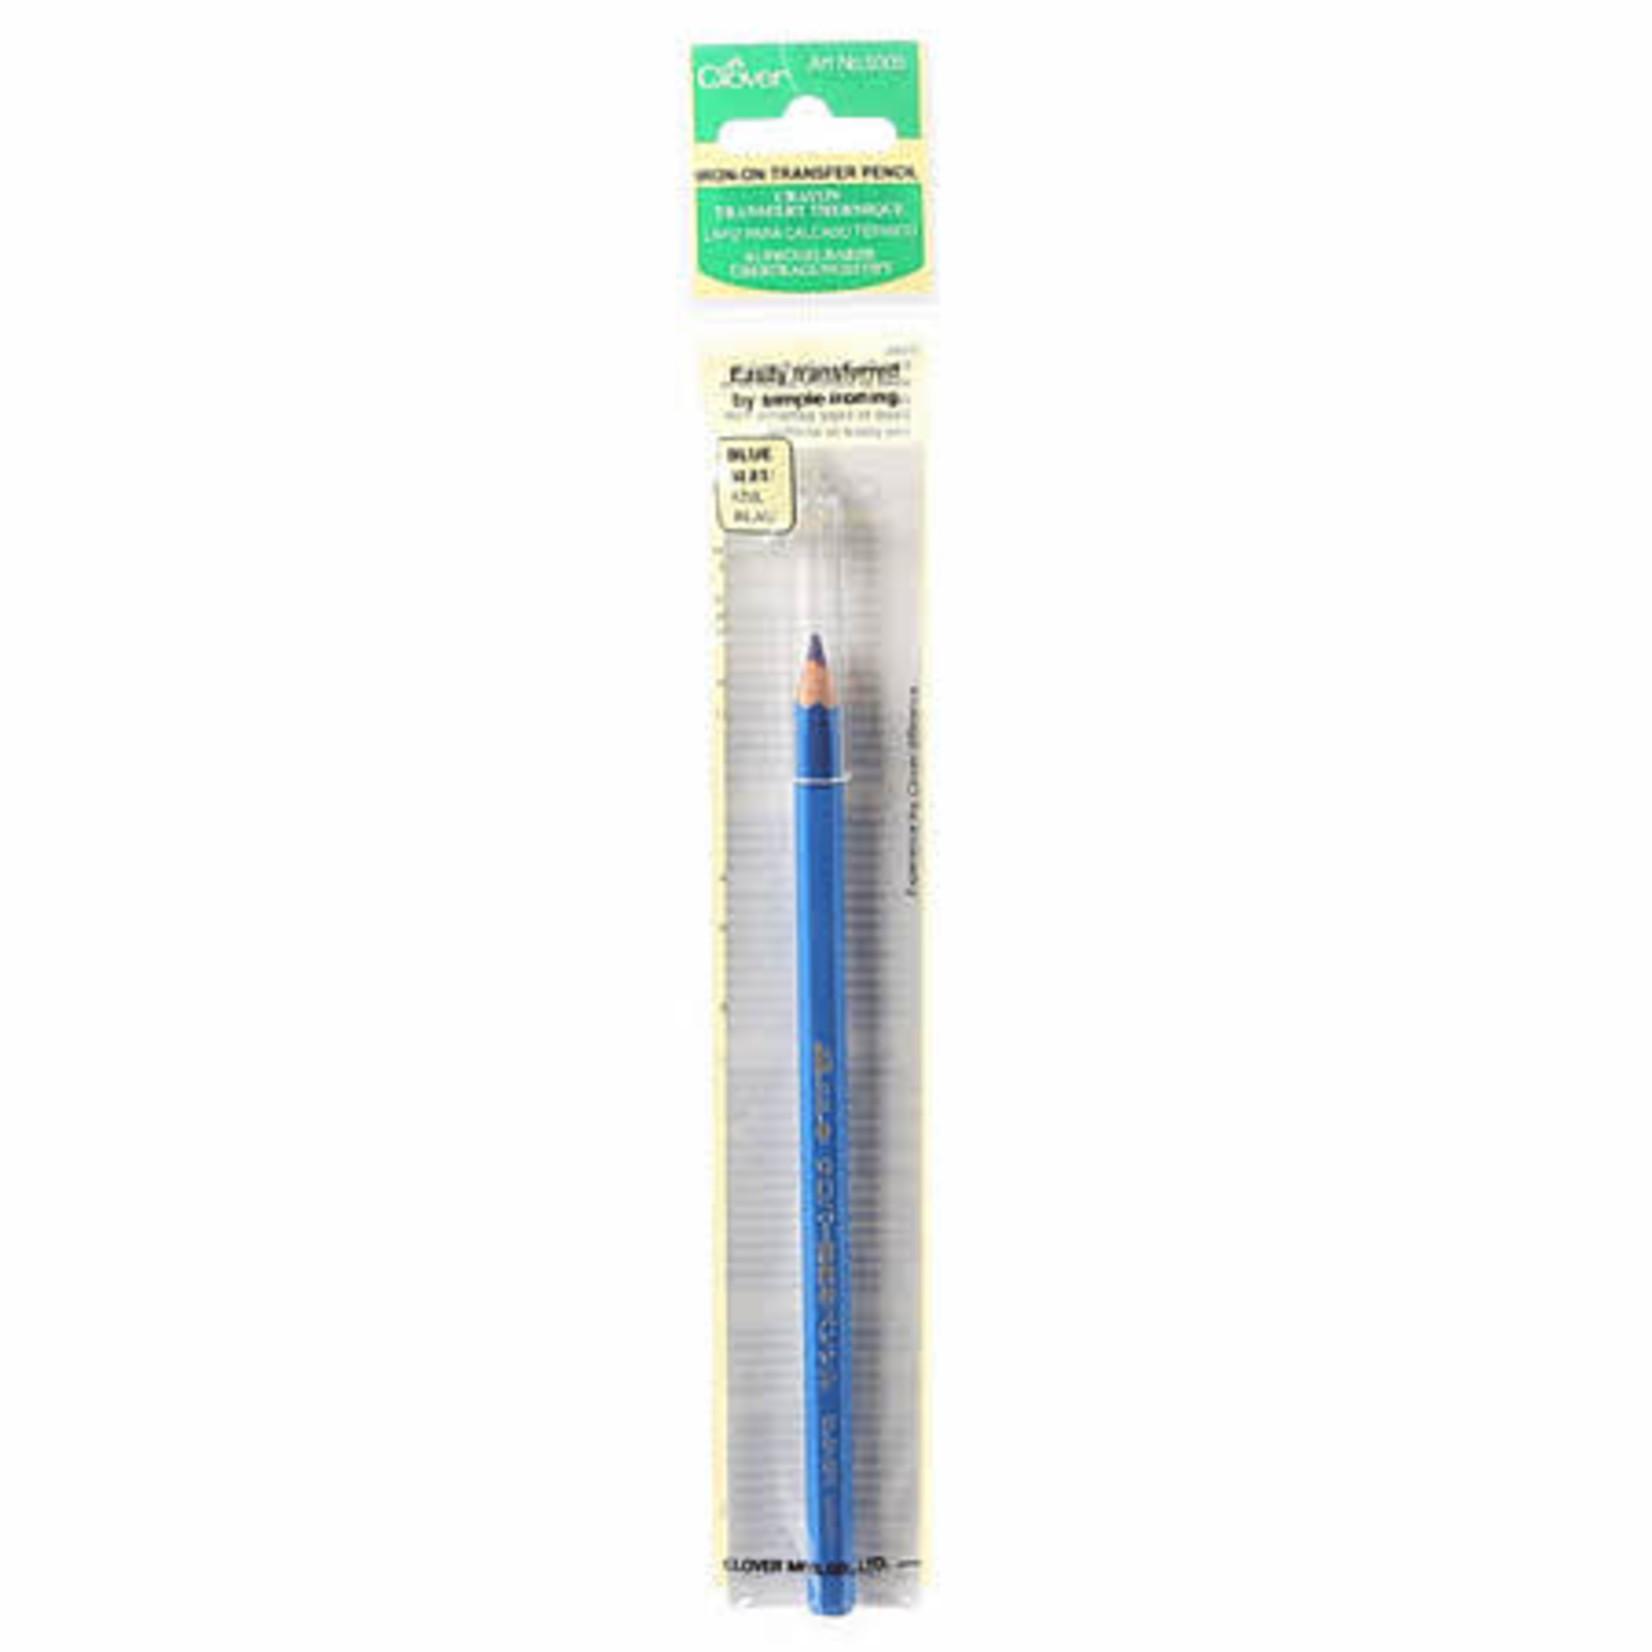 Clover Markeerpotlood 5005 - Iron on Transfer Pencil - Blauw